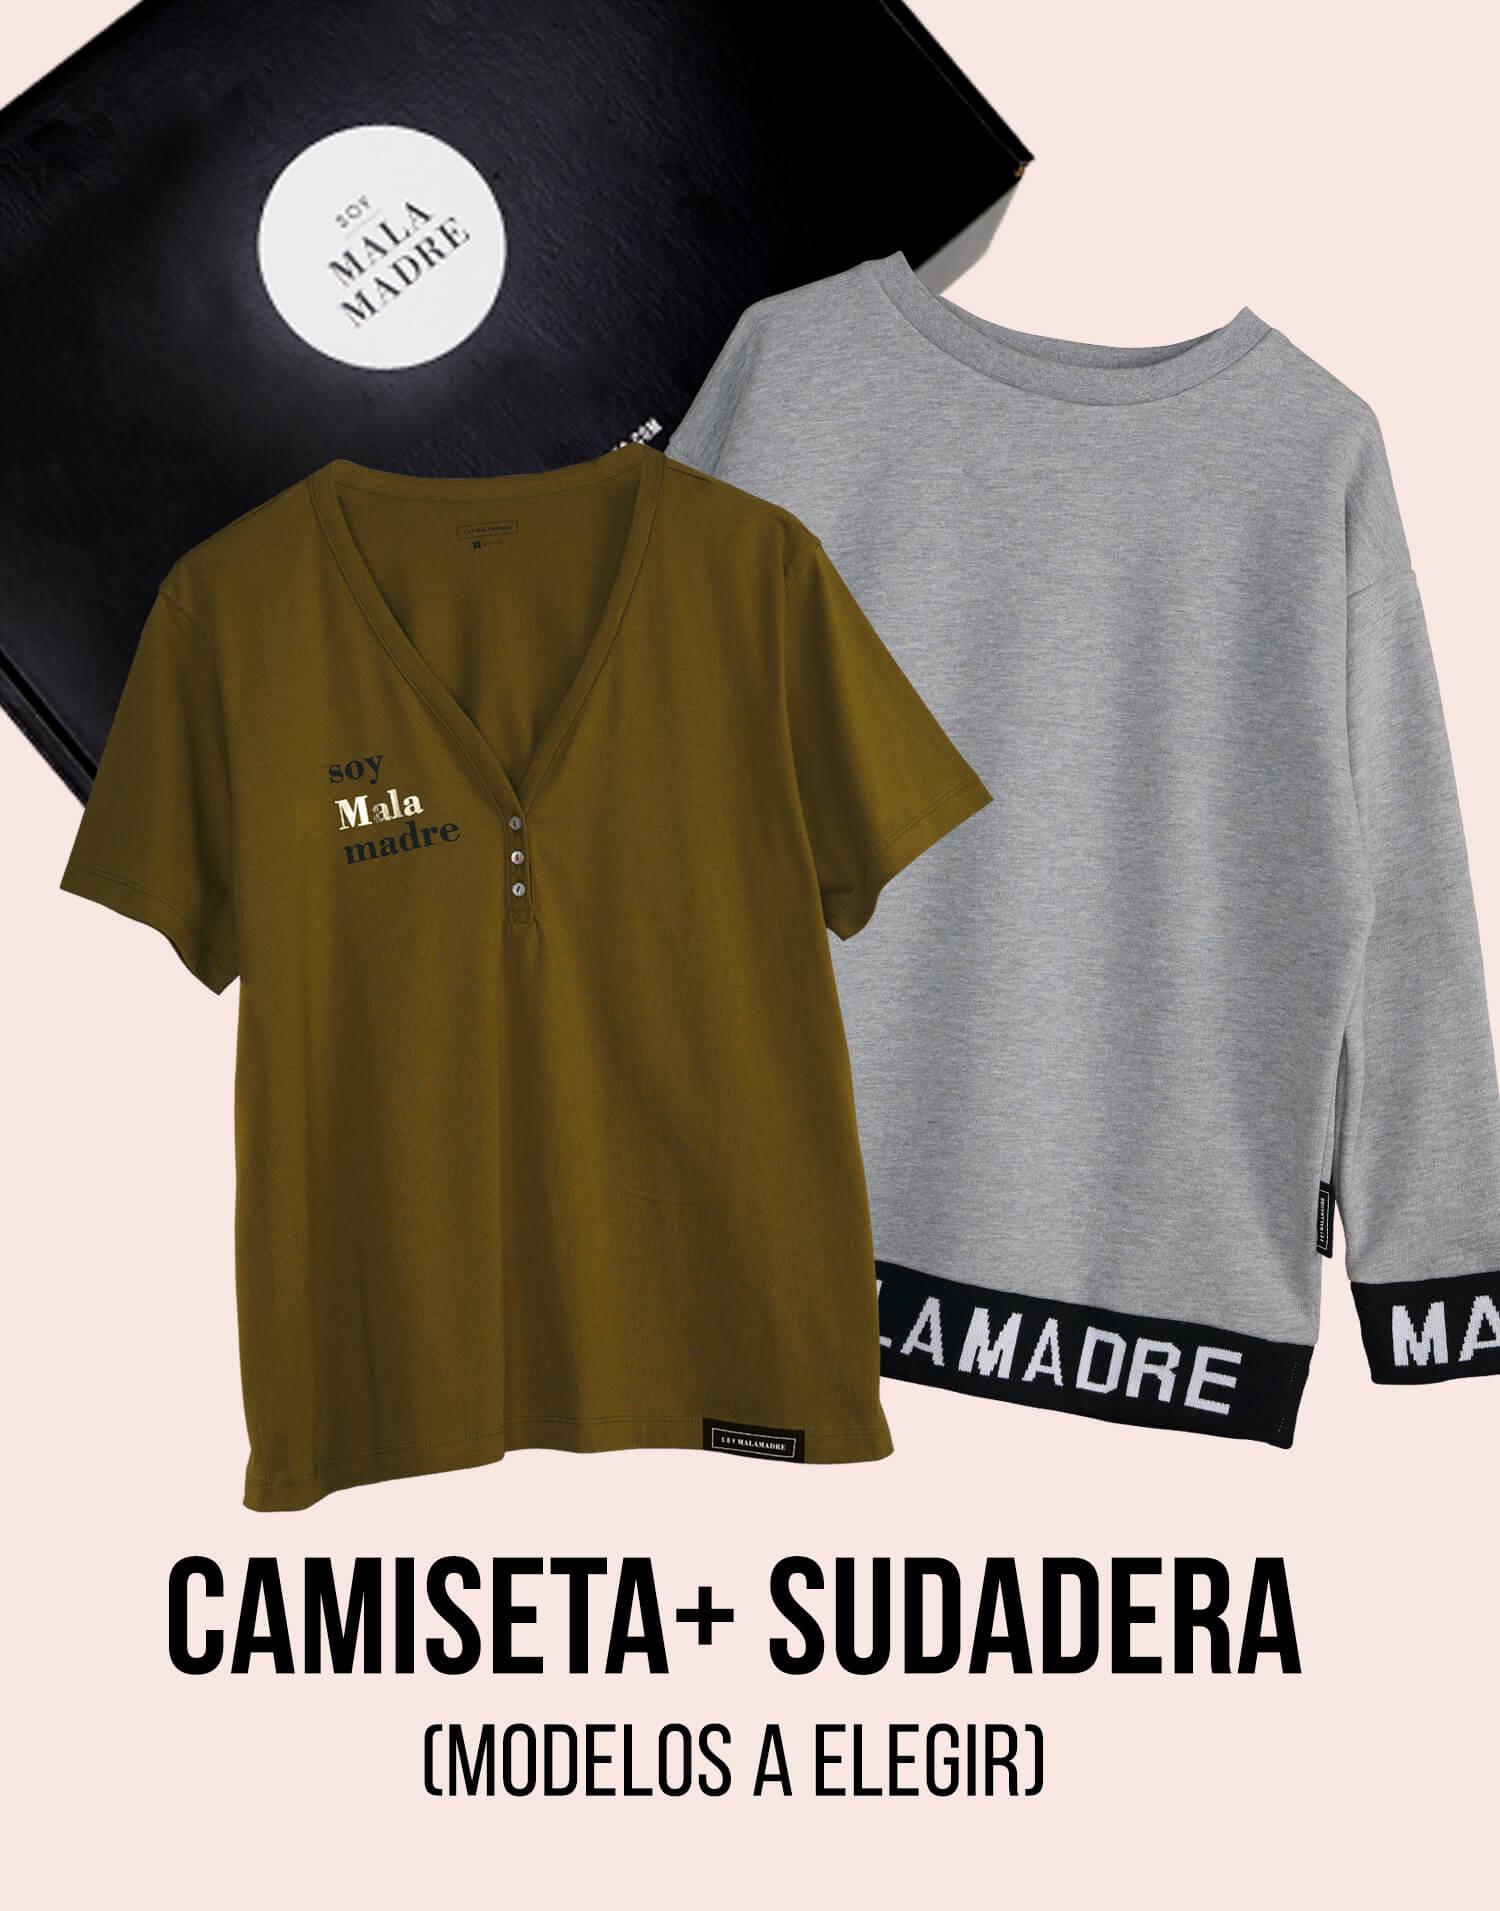 Kit camiseta Malamadre con sudadera